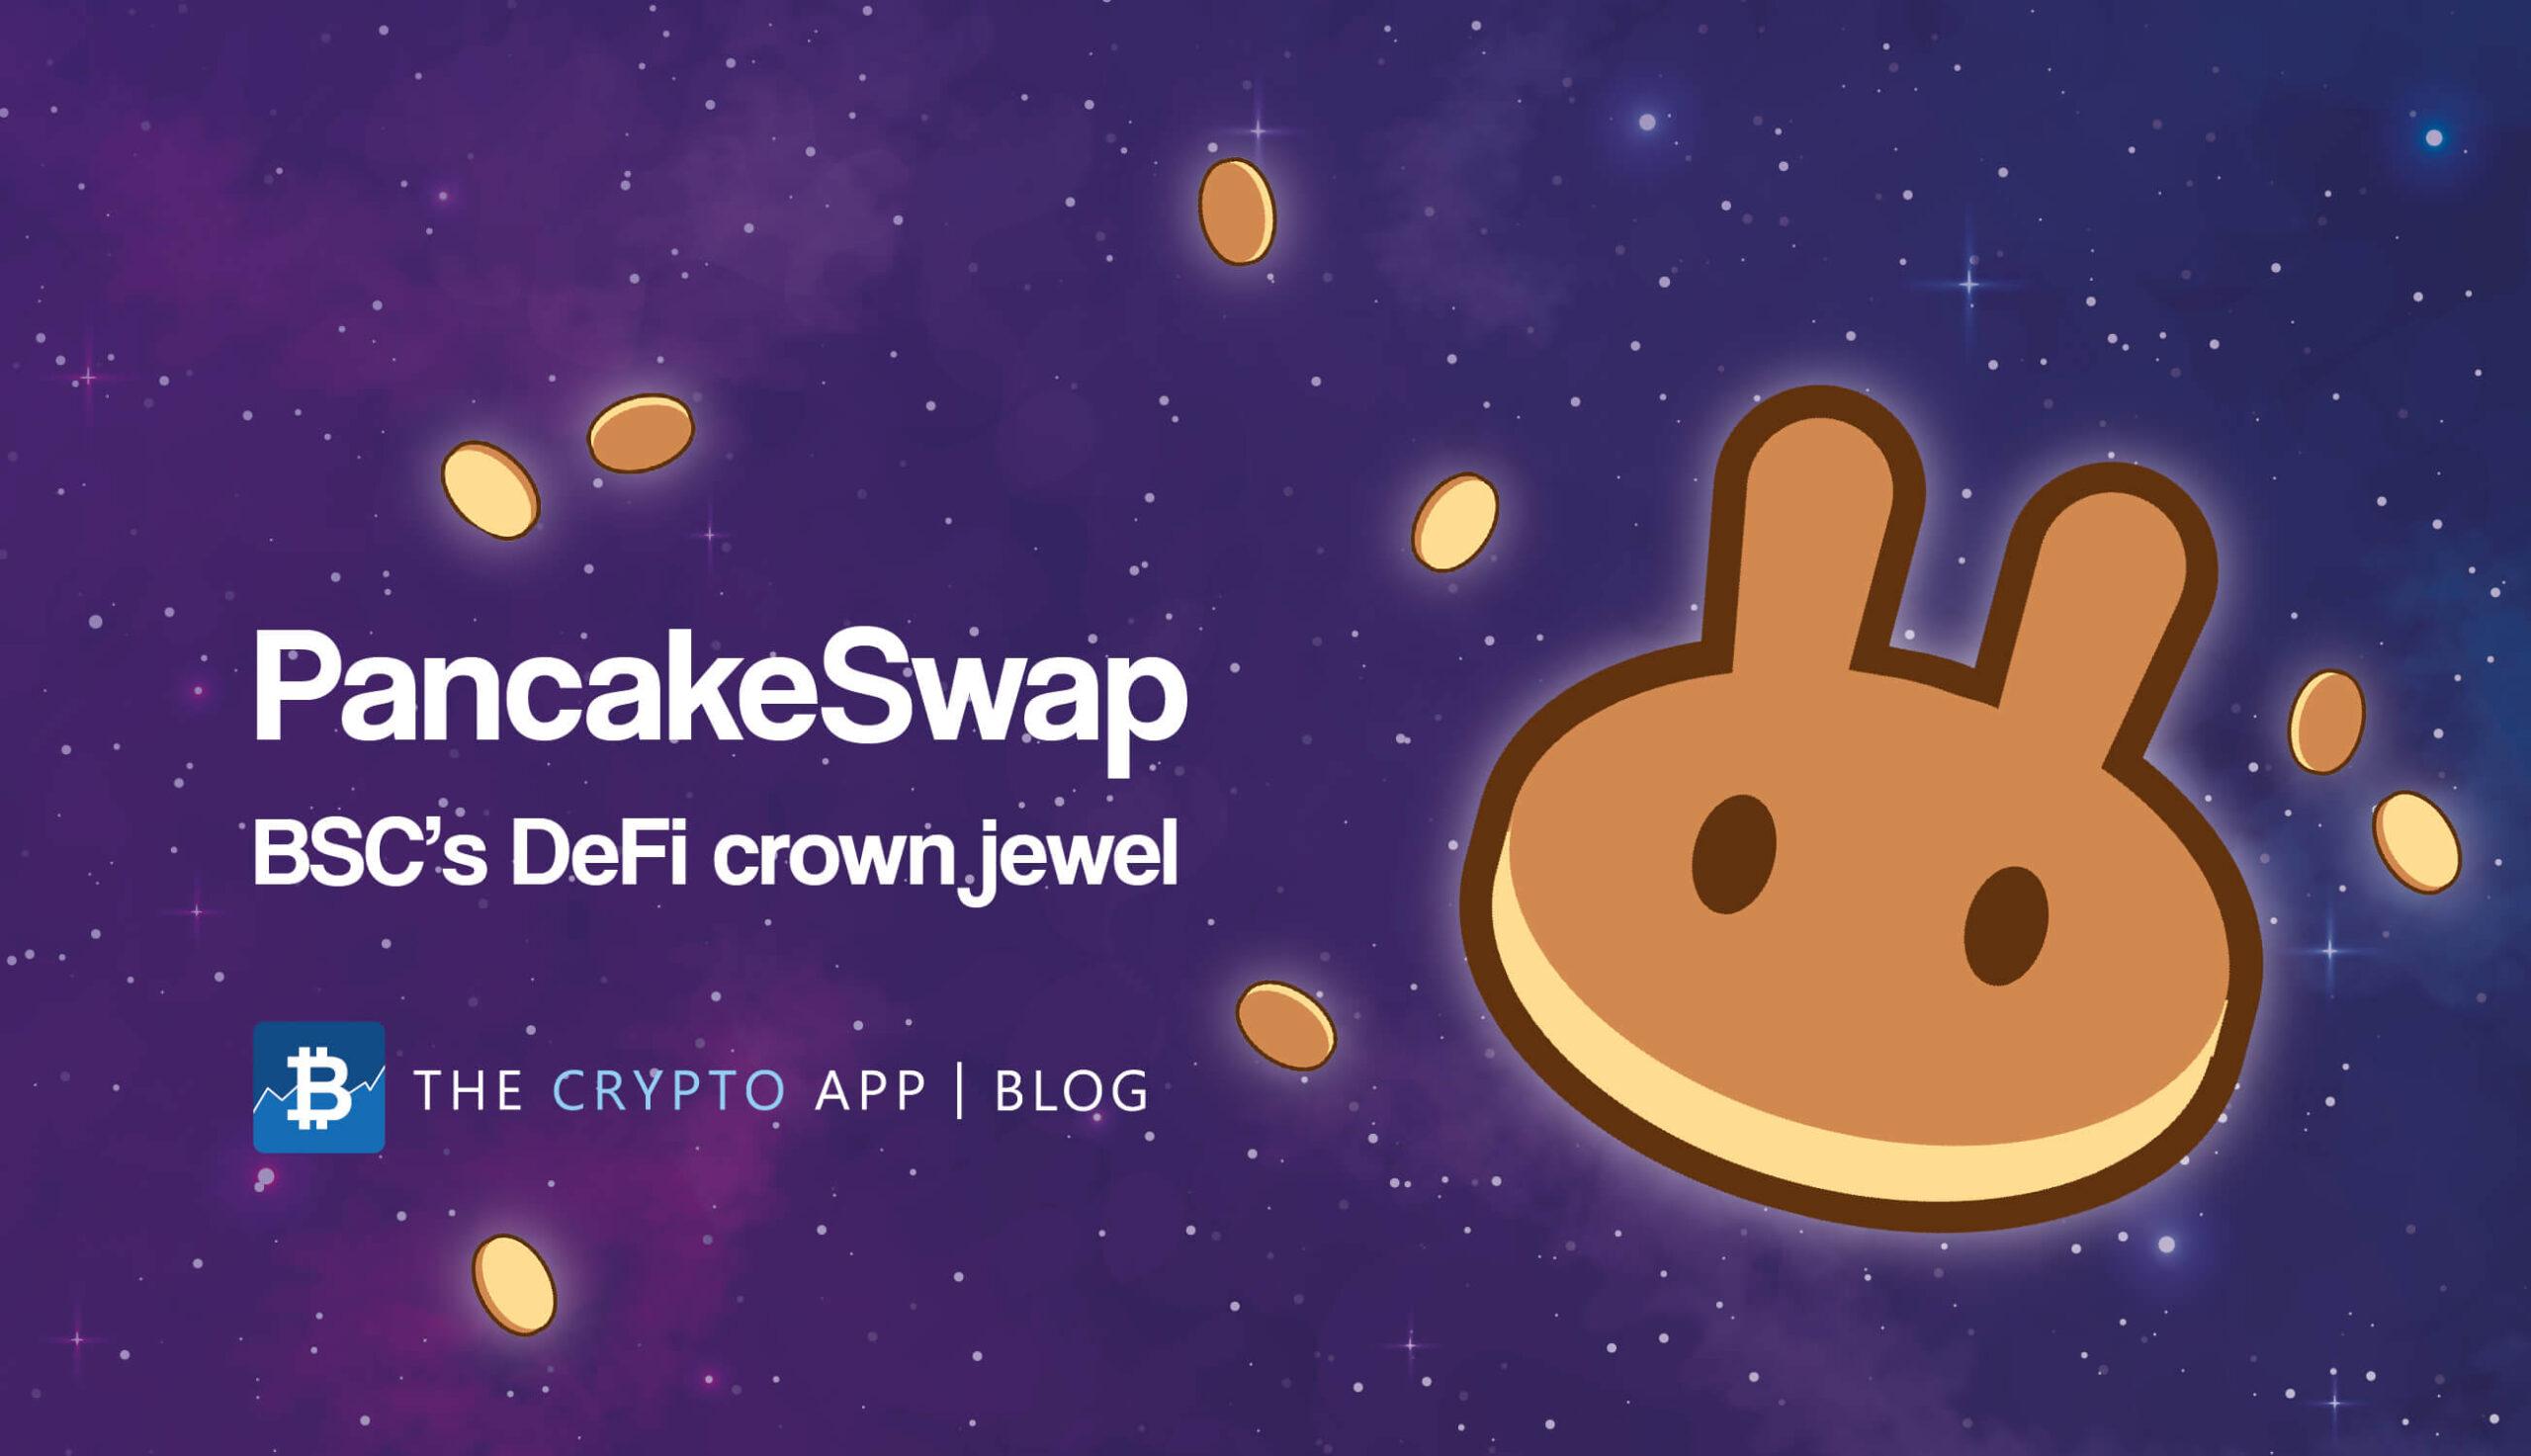 PancakeSwap: BSC's DeFi crown jewel